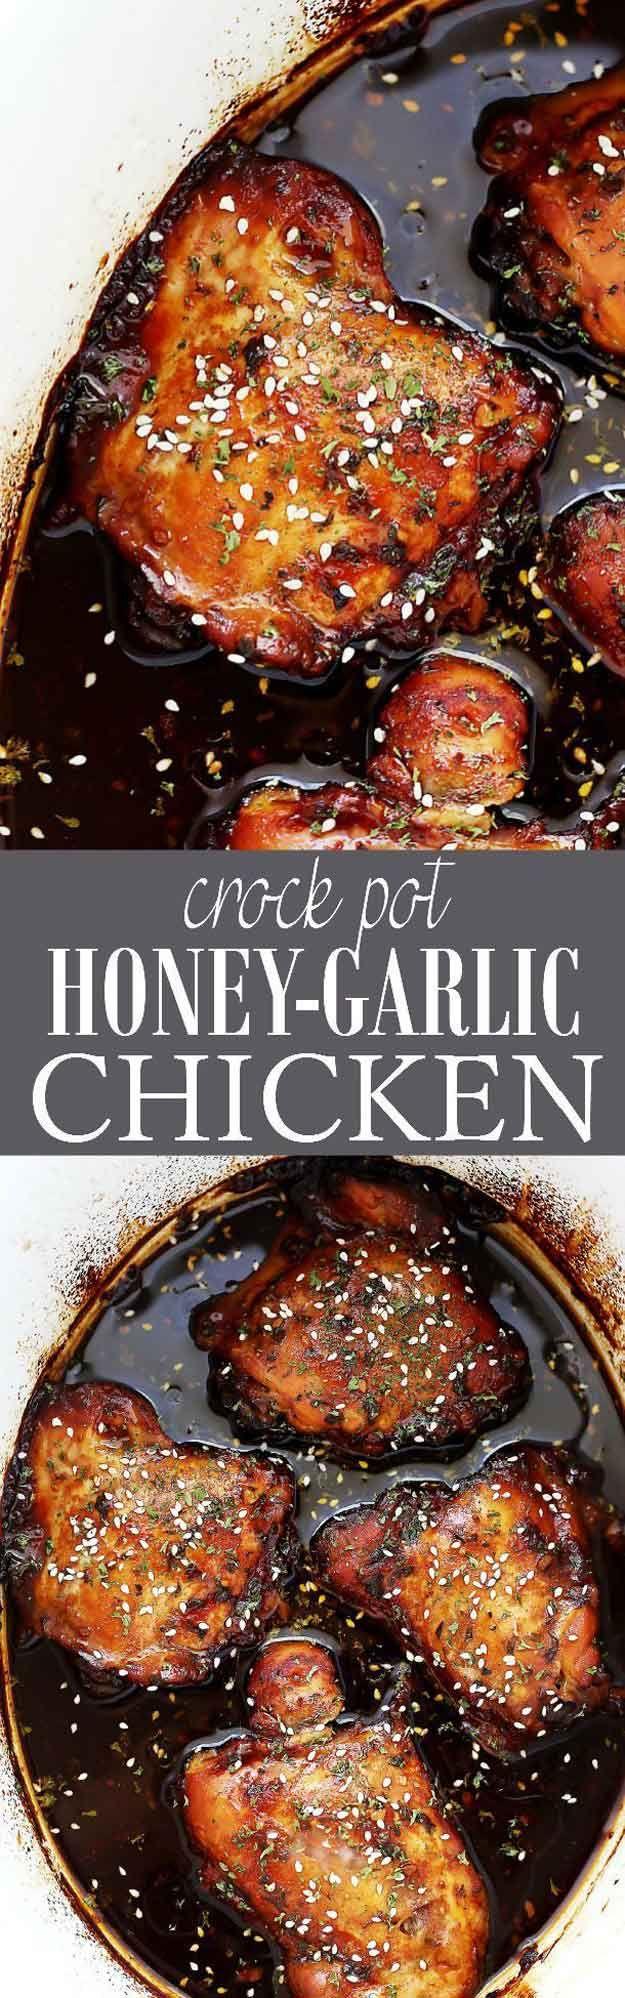 Crockpot Honey Garlic Chicken | 11 Succulent Chicken Crockpot Recipes To Make For Dinner